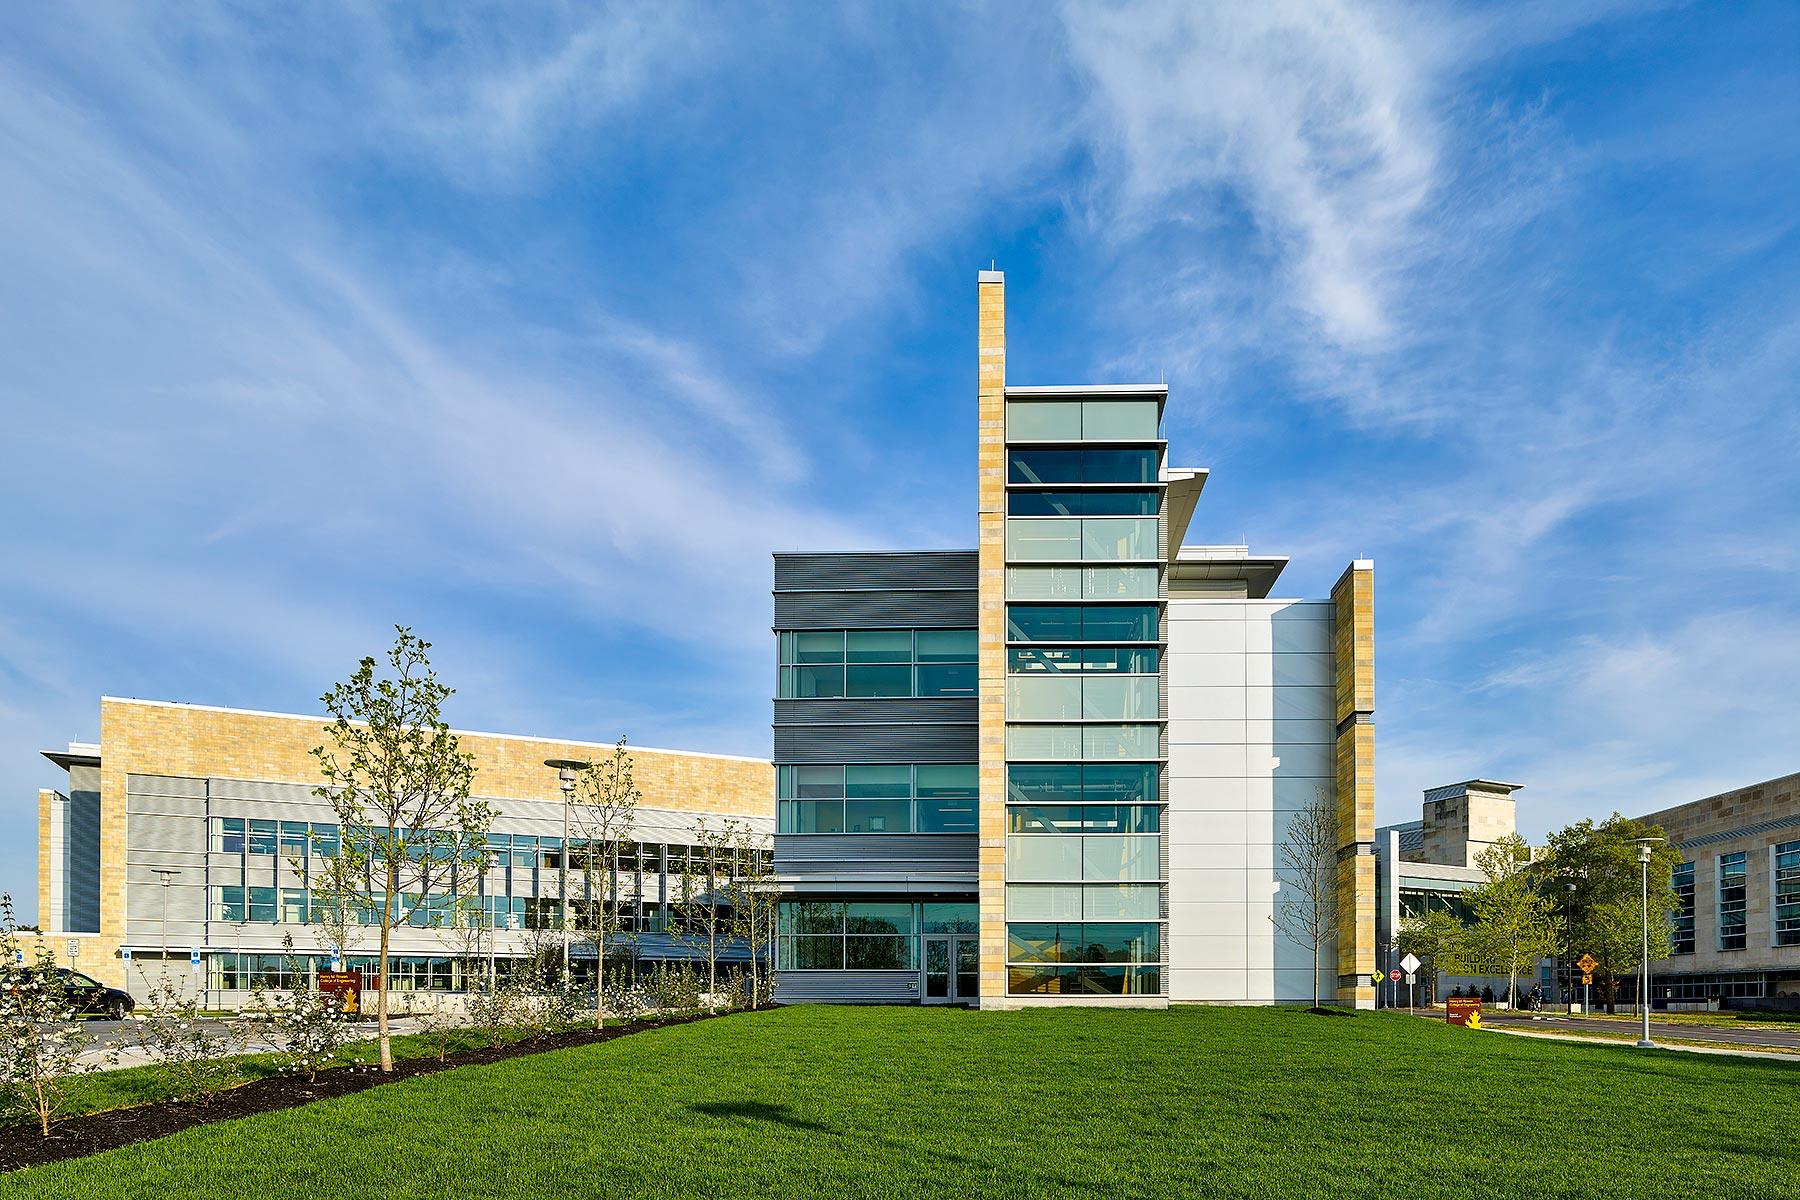 Rowan College of Engineering Clarke Caton Hintz Glassboro, NJ